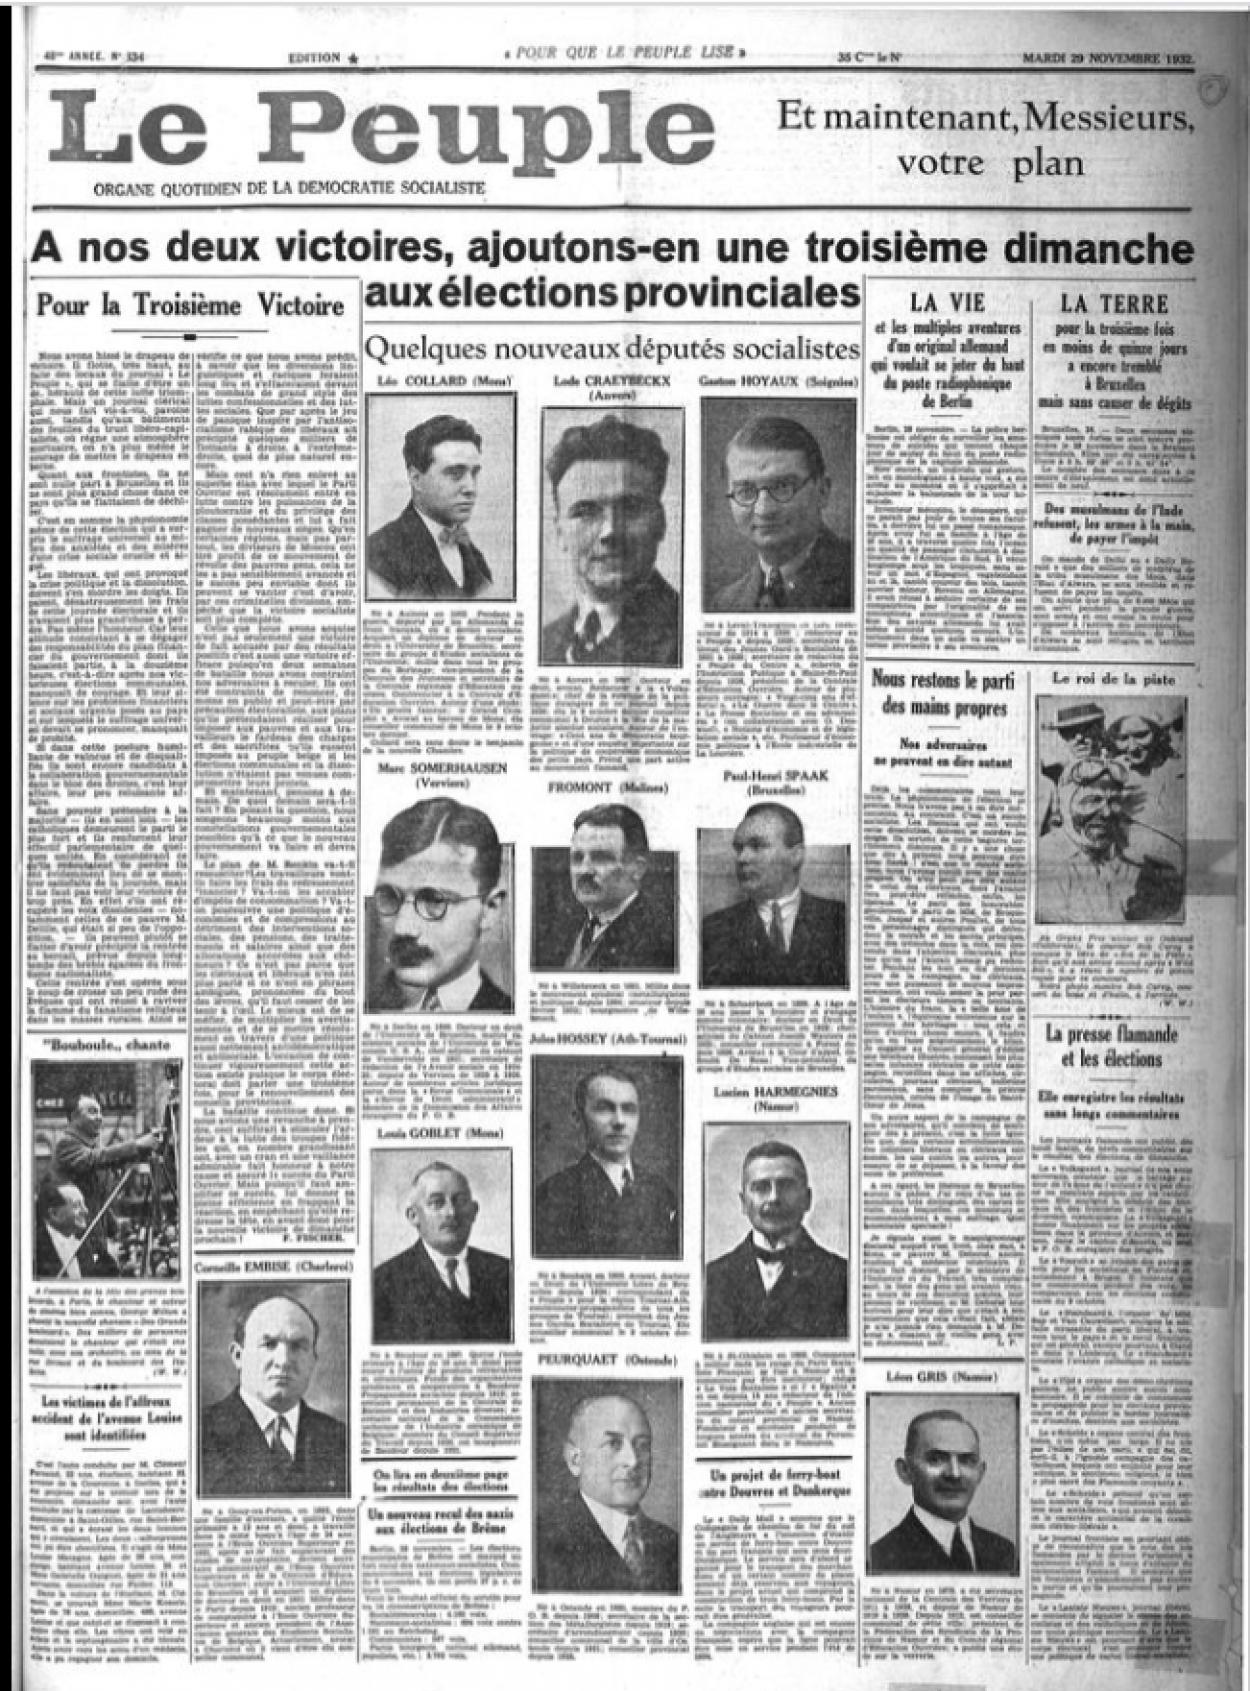 le-peuple-29-11-1932(2).png